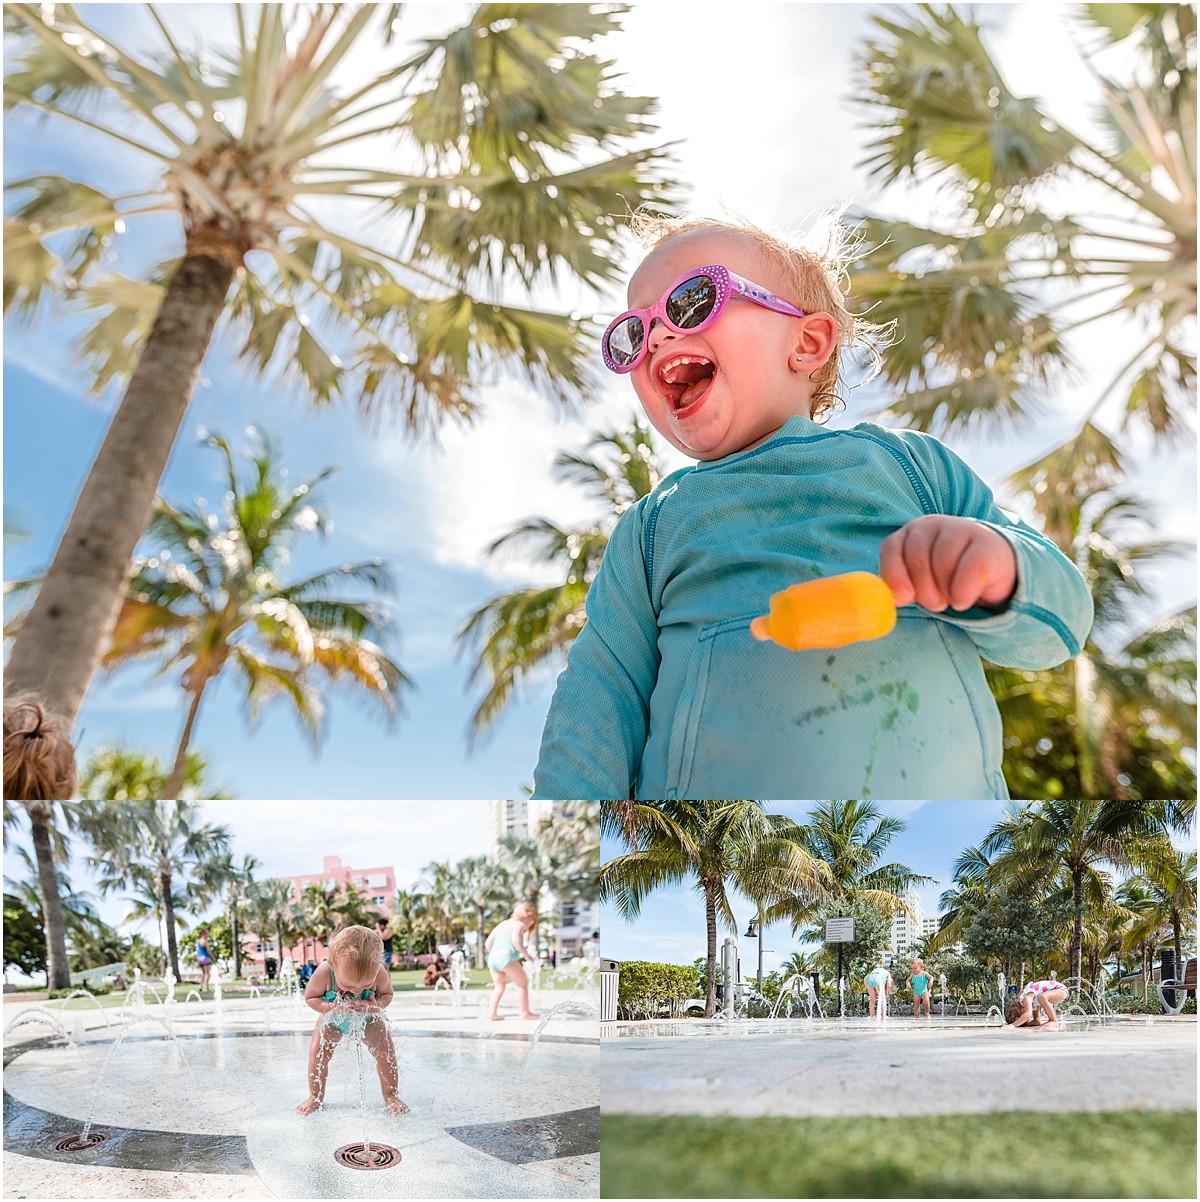 Ashley_Rogers_Photography_South_Florida_Photographer_Orlando_Photographer_Costa_Rica_Photographer_0823.jpg